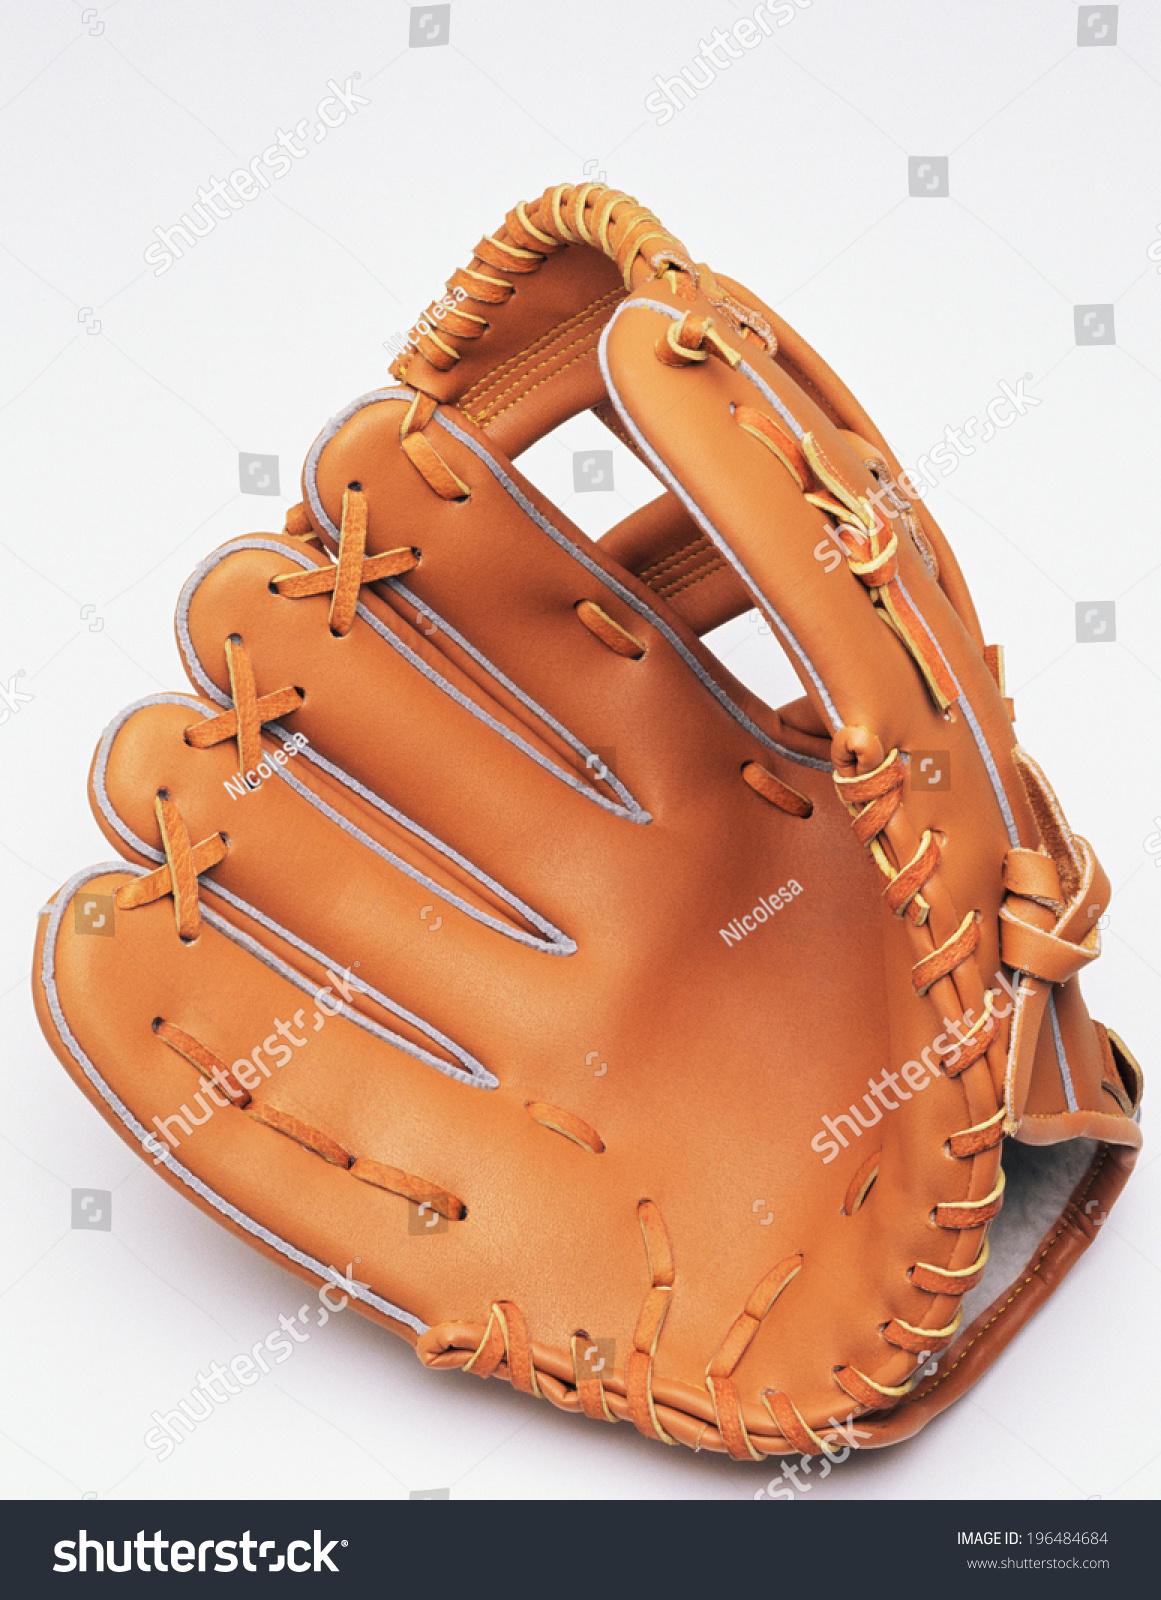 leather baseball glove #196484684